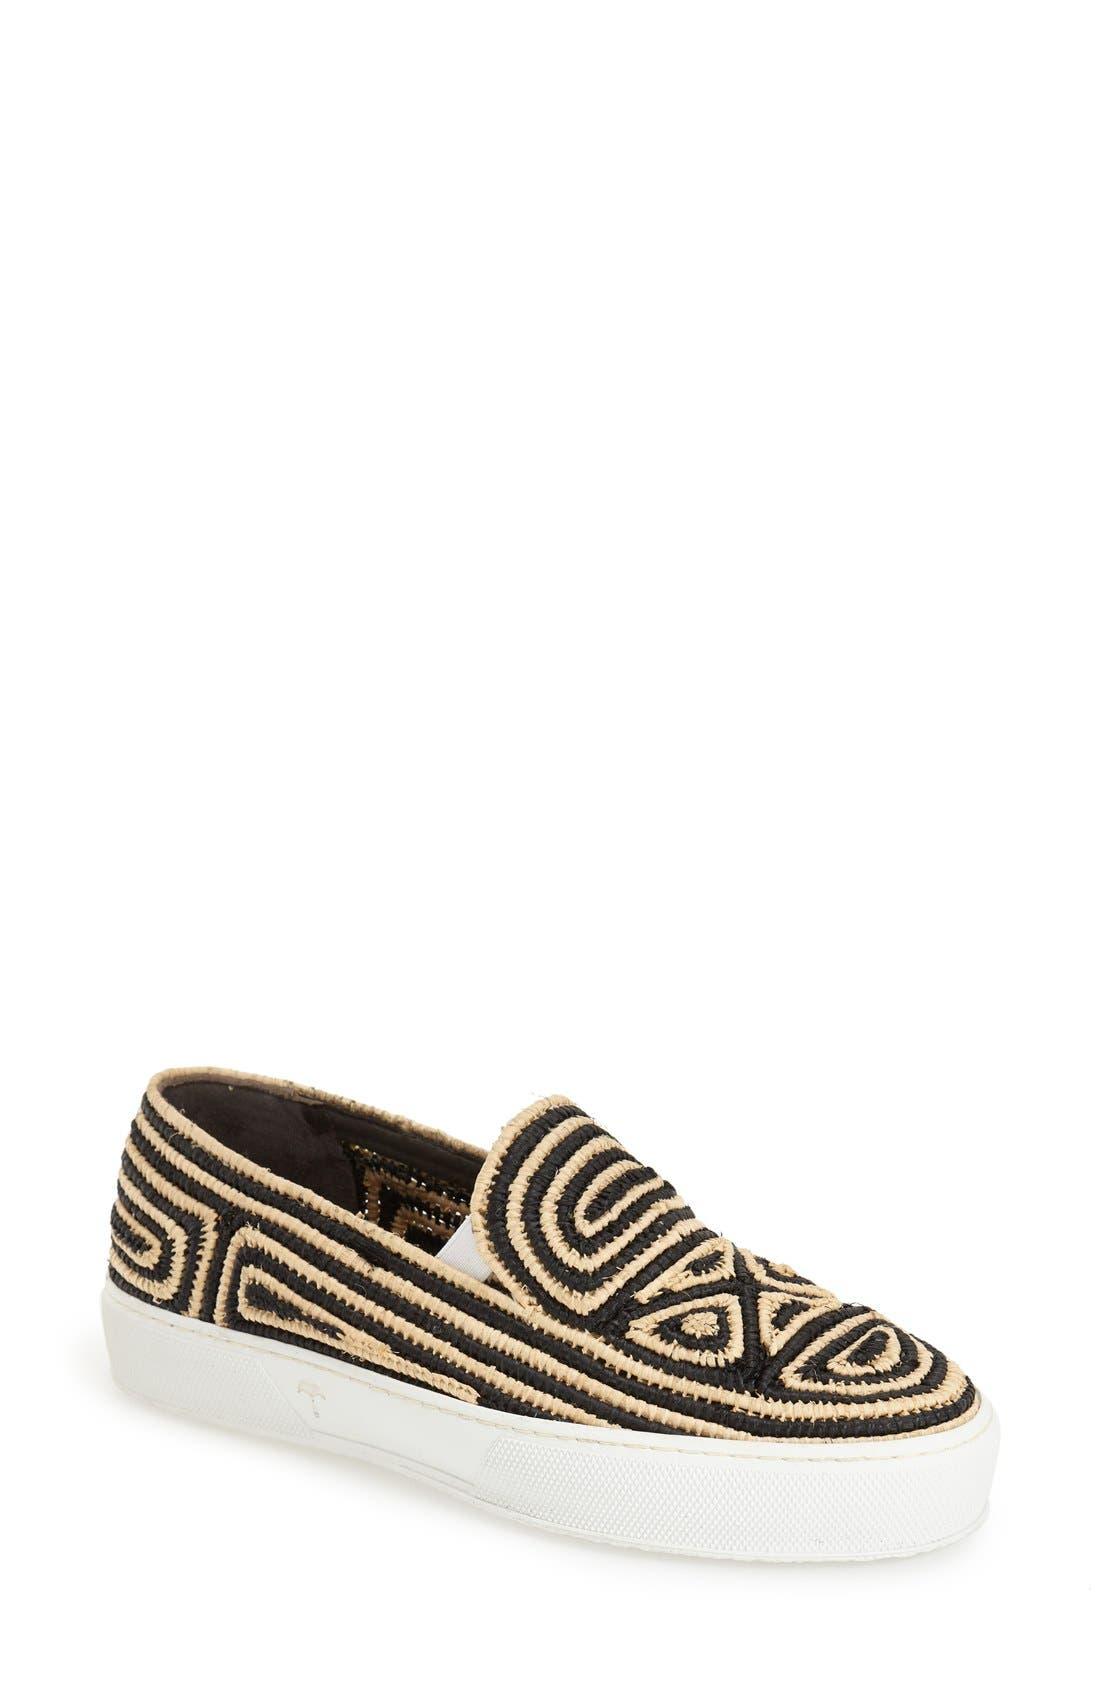 Main Image - Robert Clergerie Woven Slip-On Sneaker (Women)